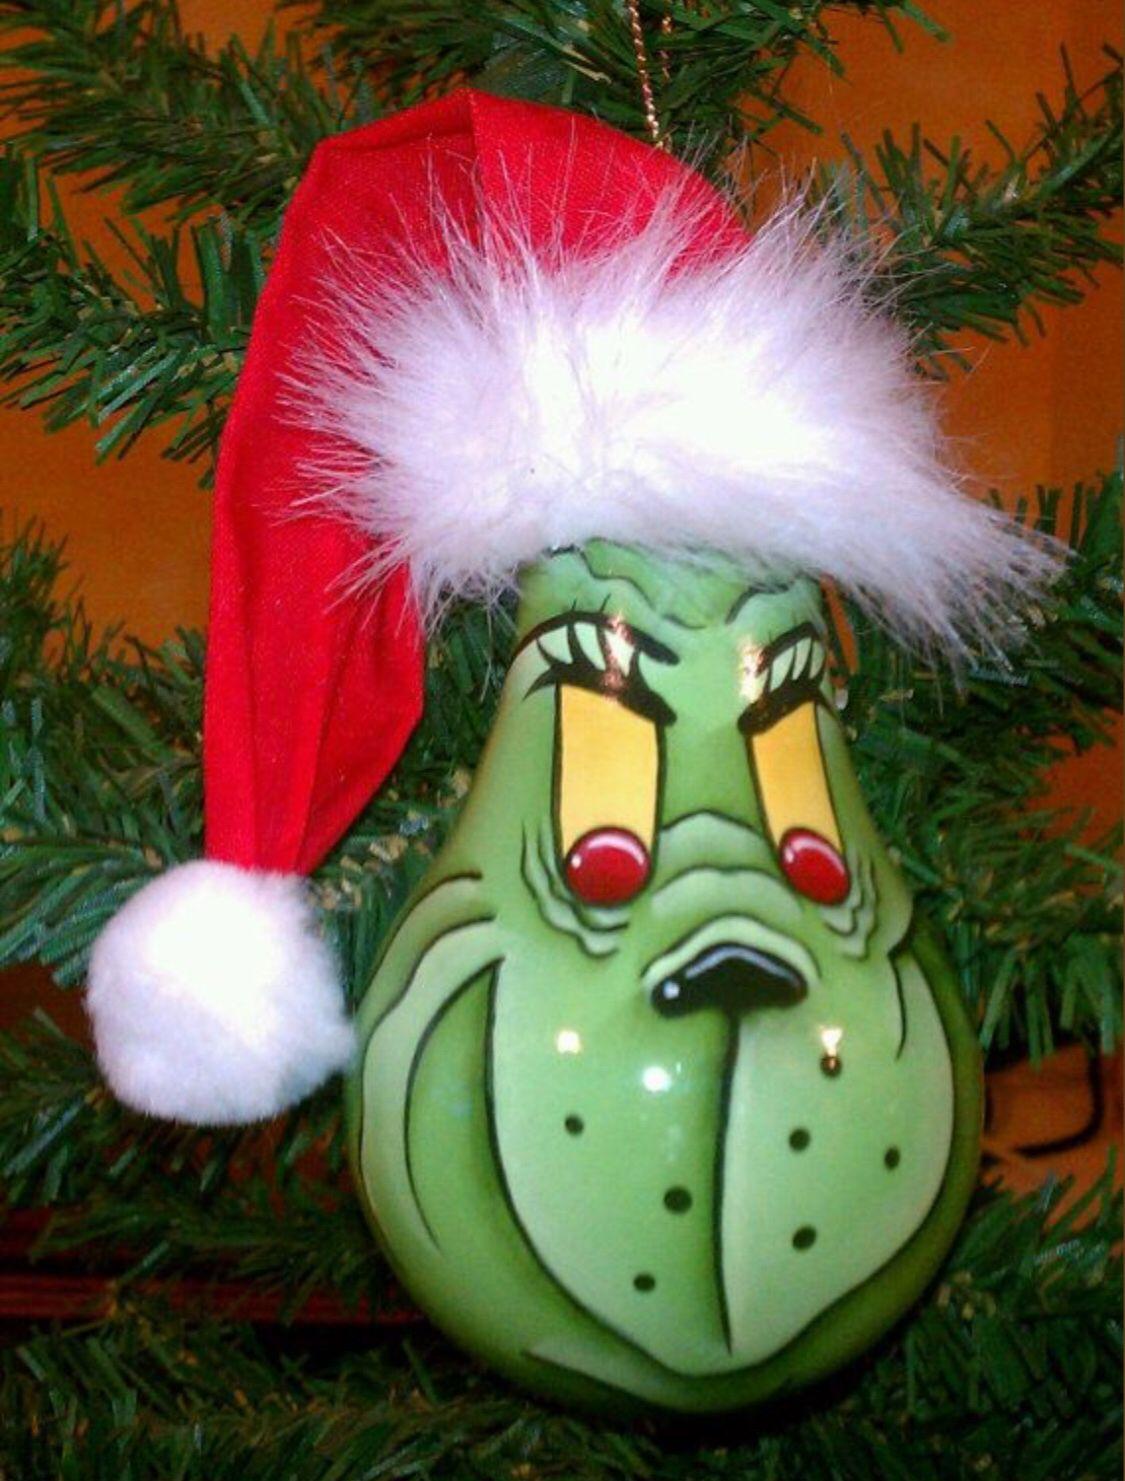 Grinch Lightbulb Christmas Ornaments Xmas Crafts Grinch Christmas Decorations